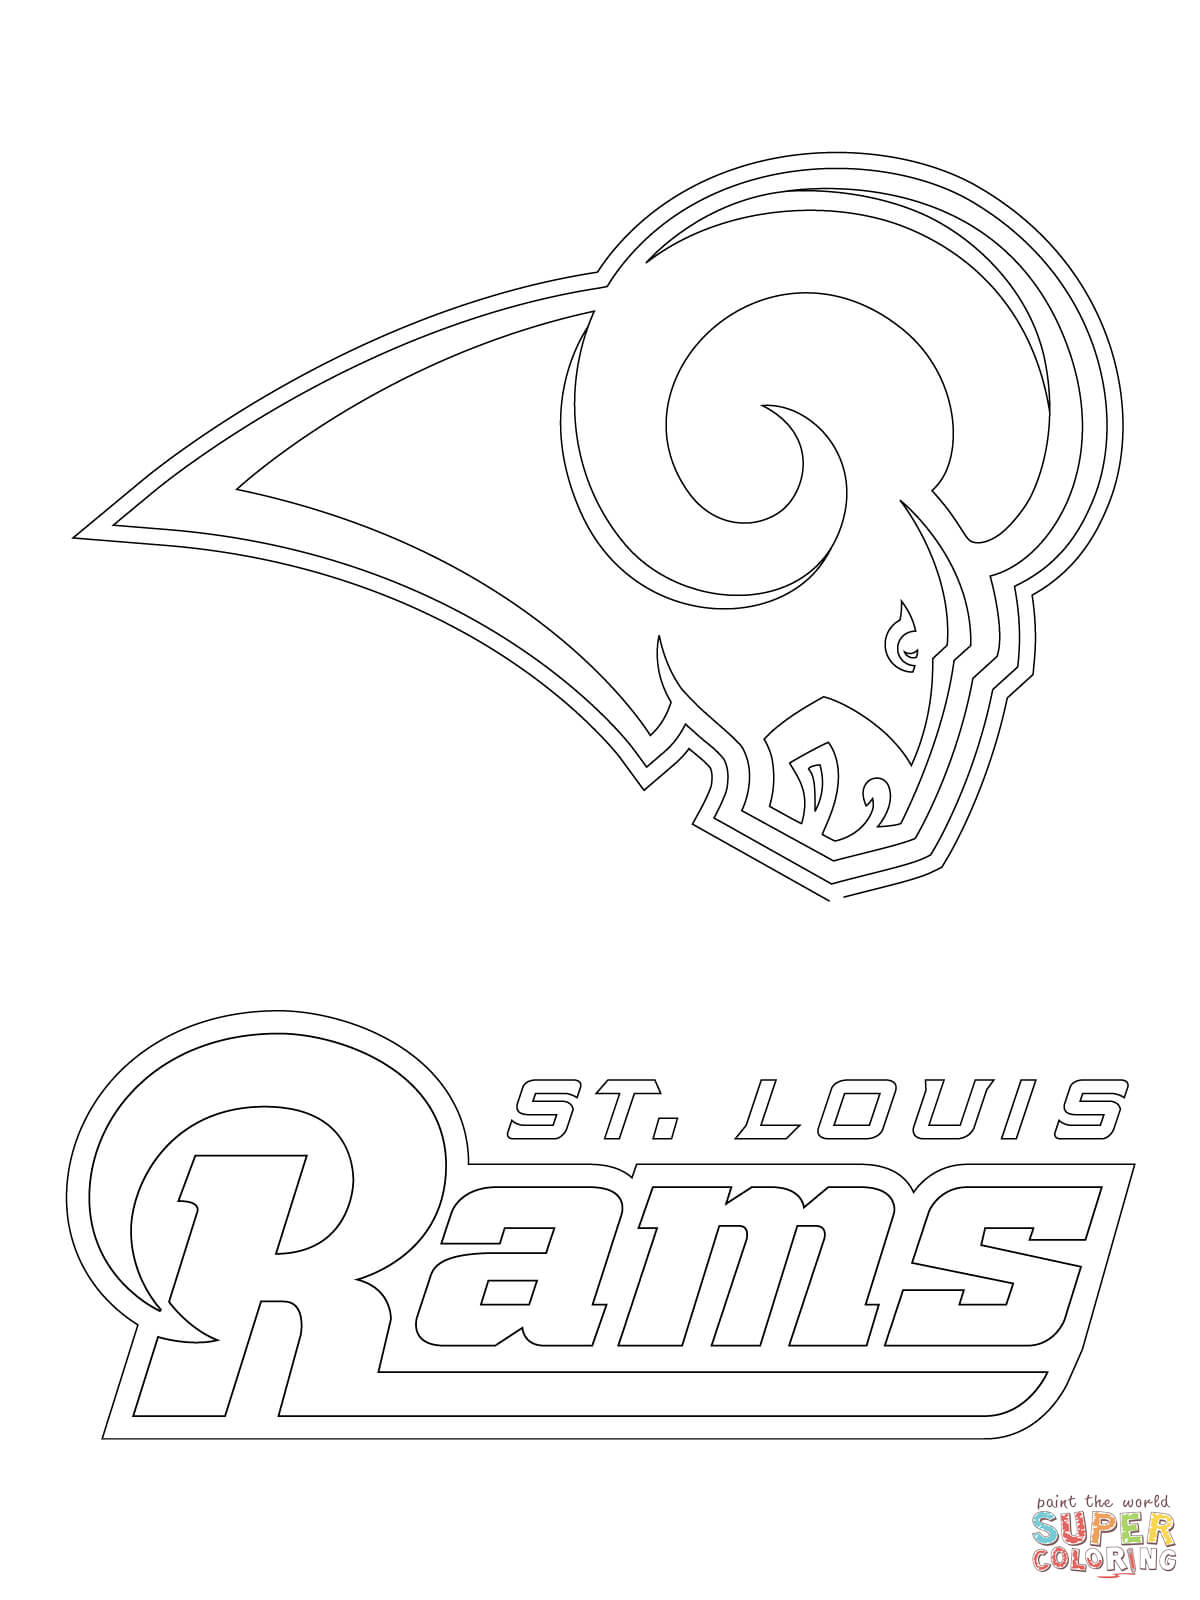 St Louis Rams Logo Coloring Page